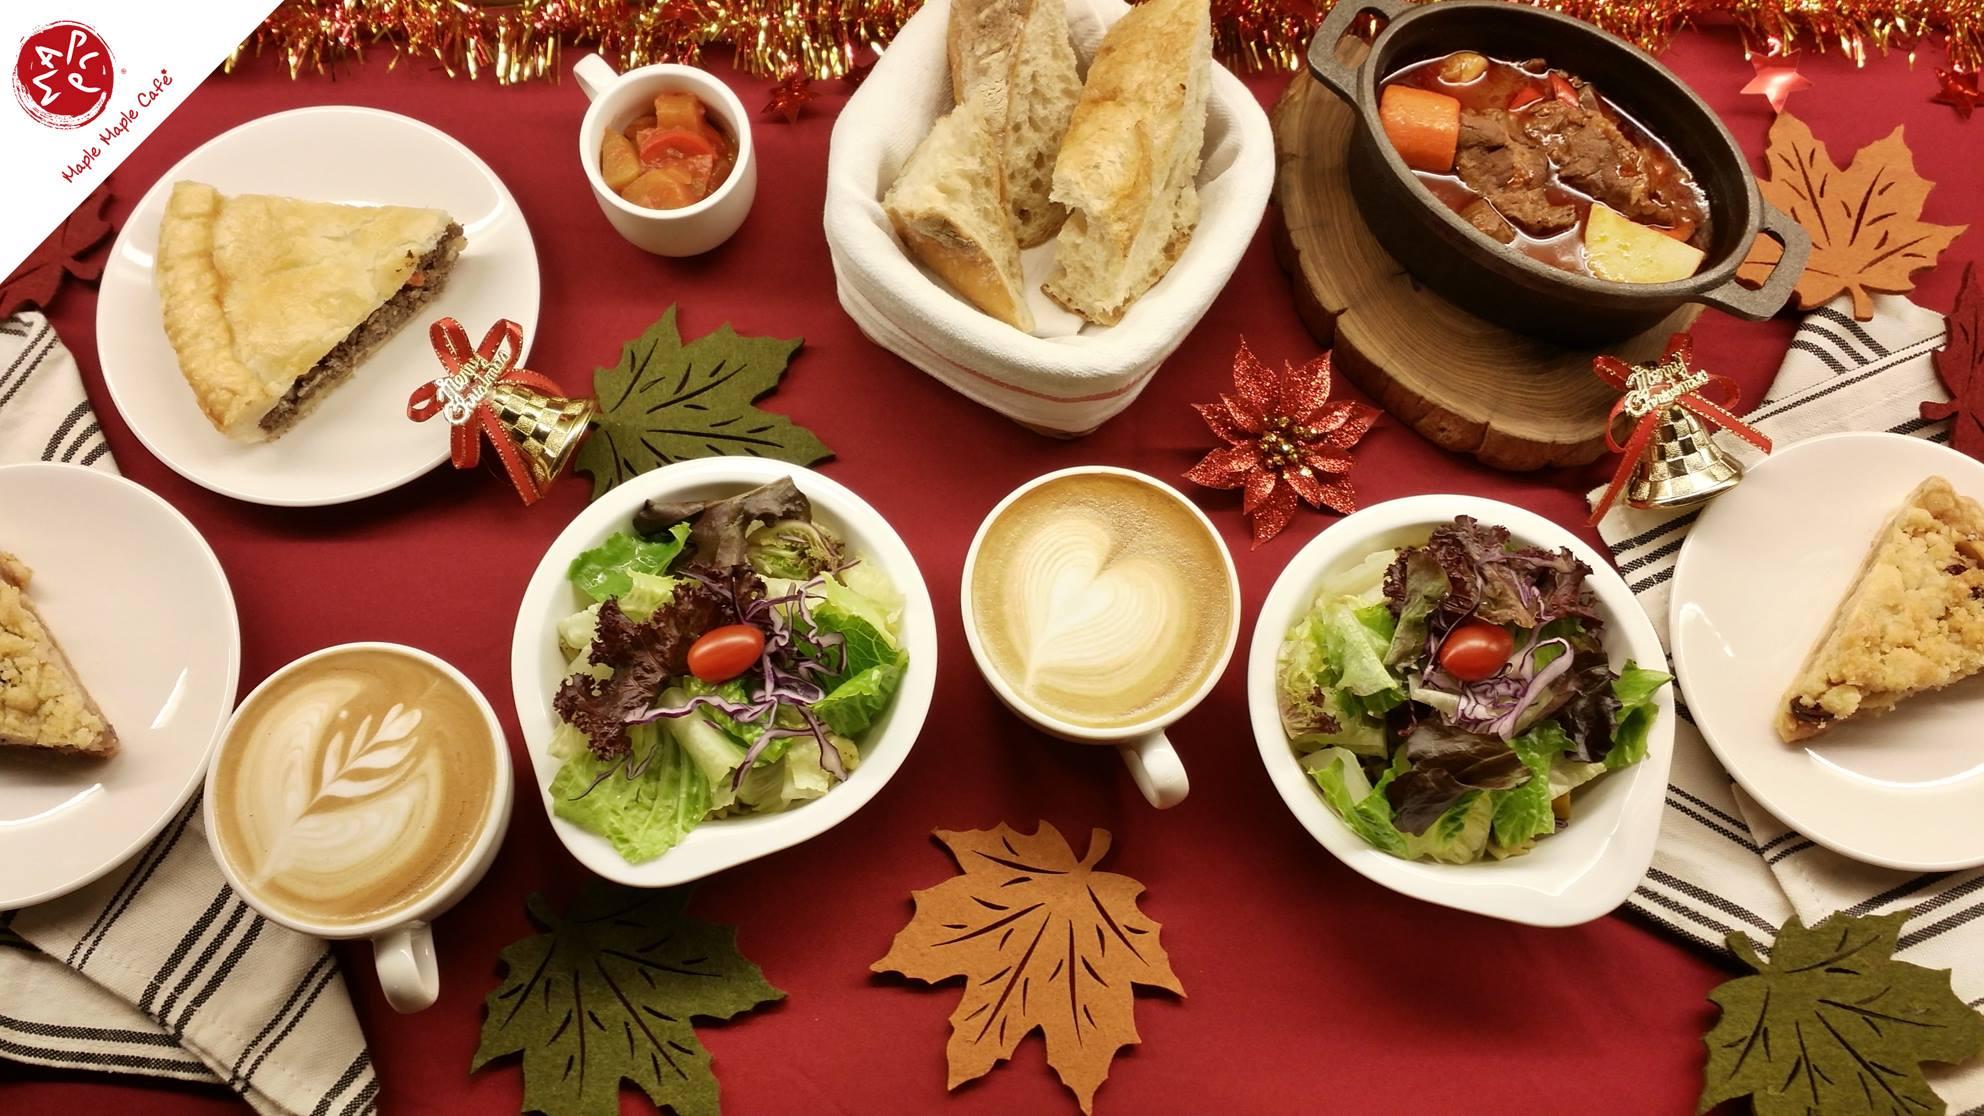 Canadian Christmas Season Feast - 加拿大聖誕節日套餐 - Canadian ...